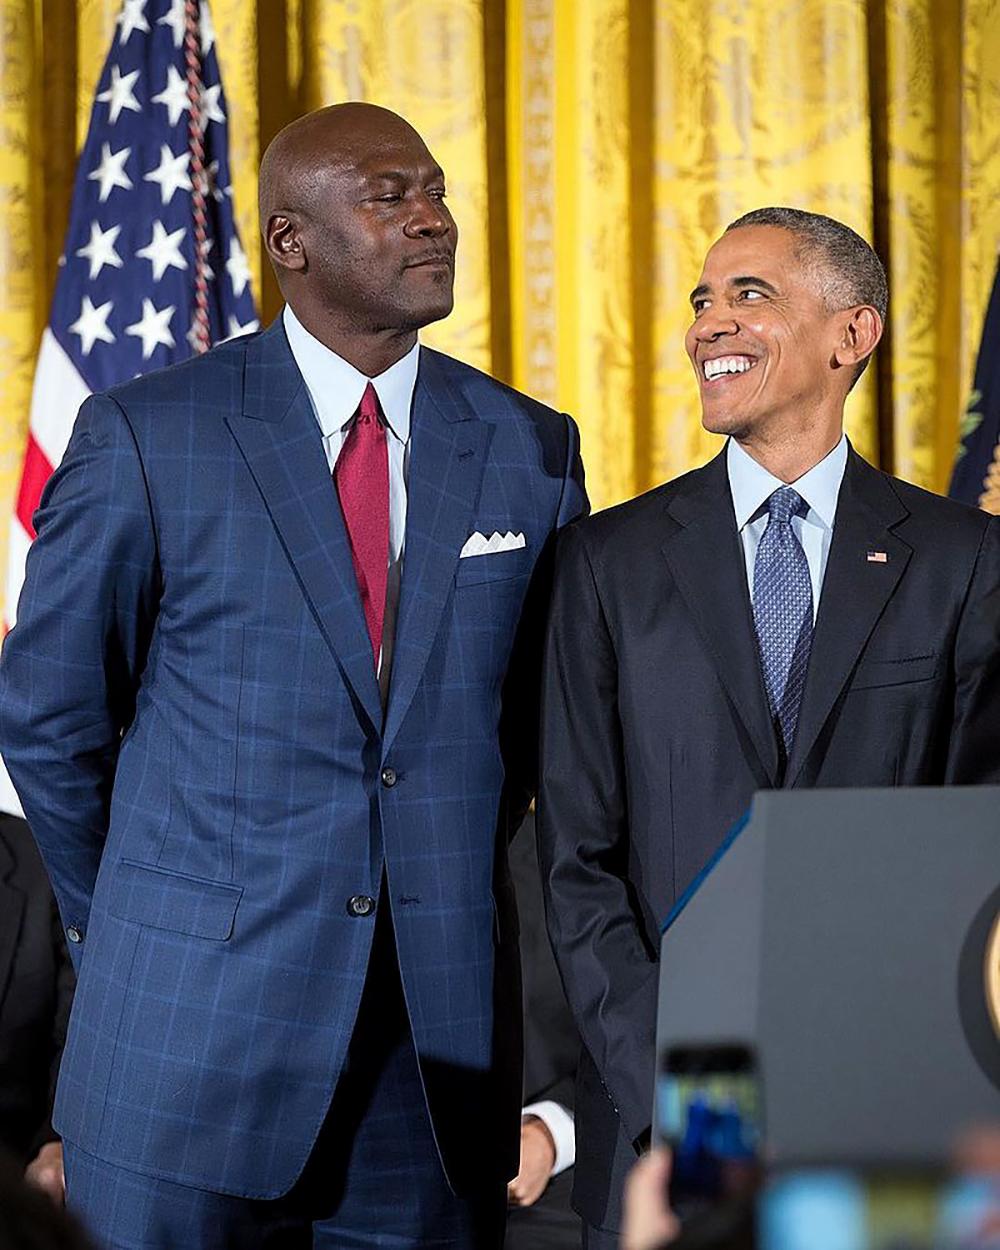 Майкл Джордан и Барак Обама